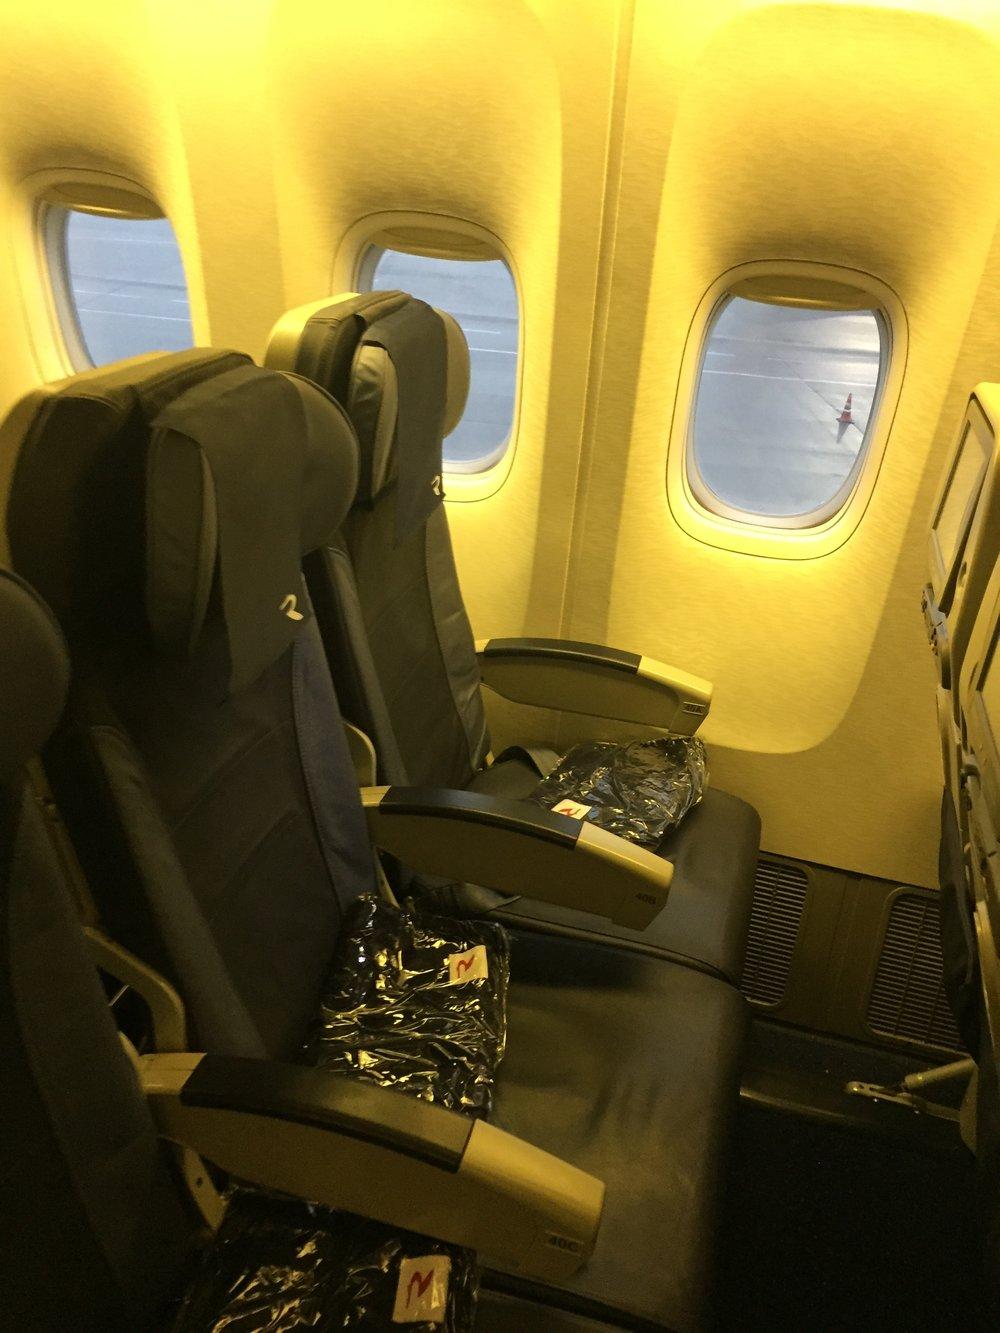 rossiya airlines economy.JPG